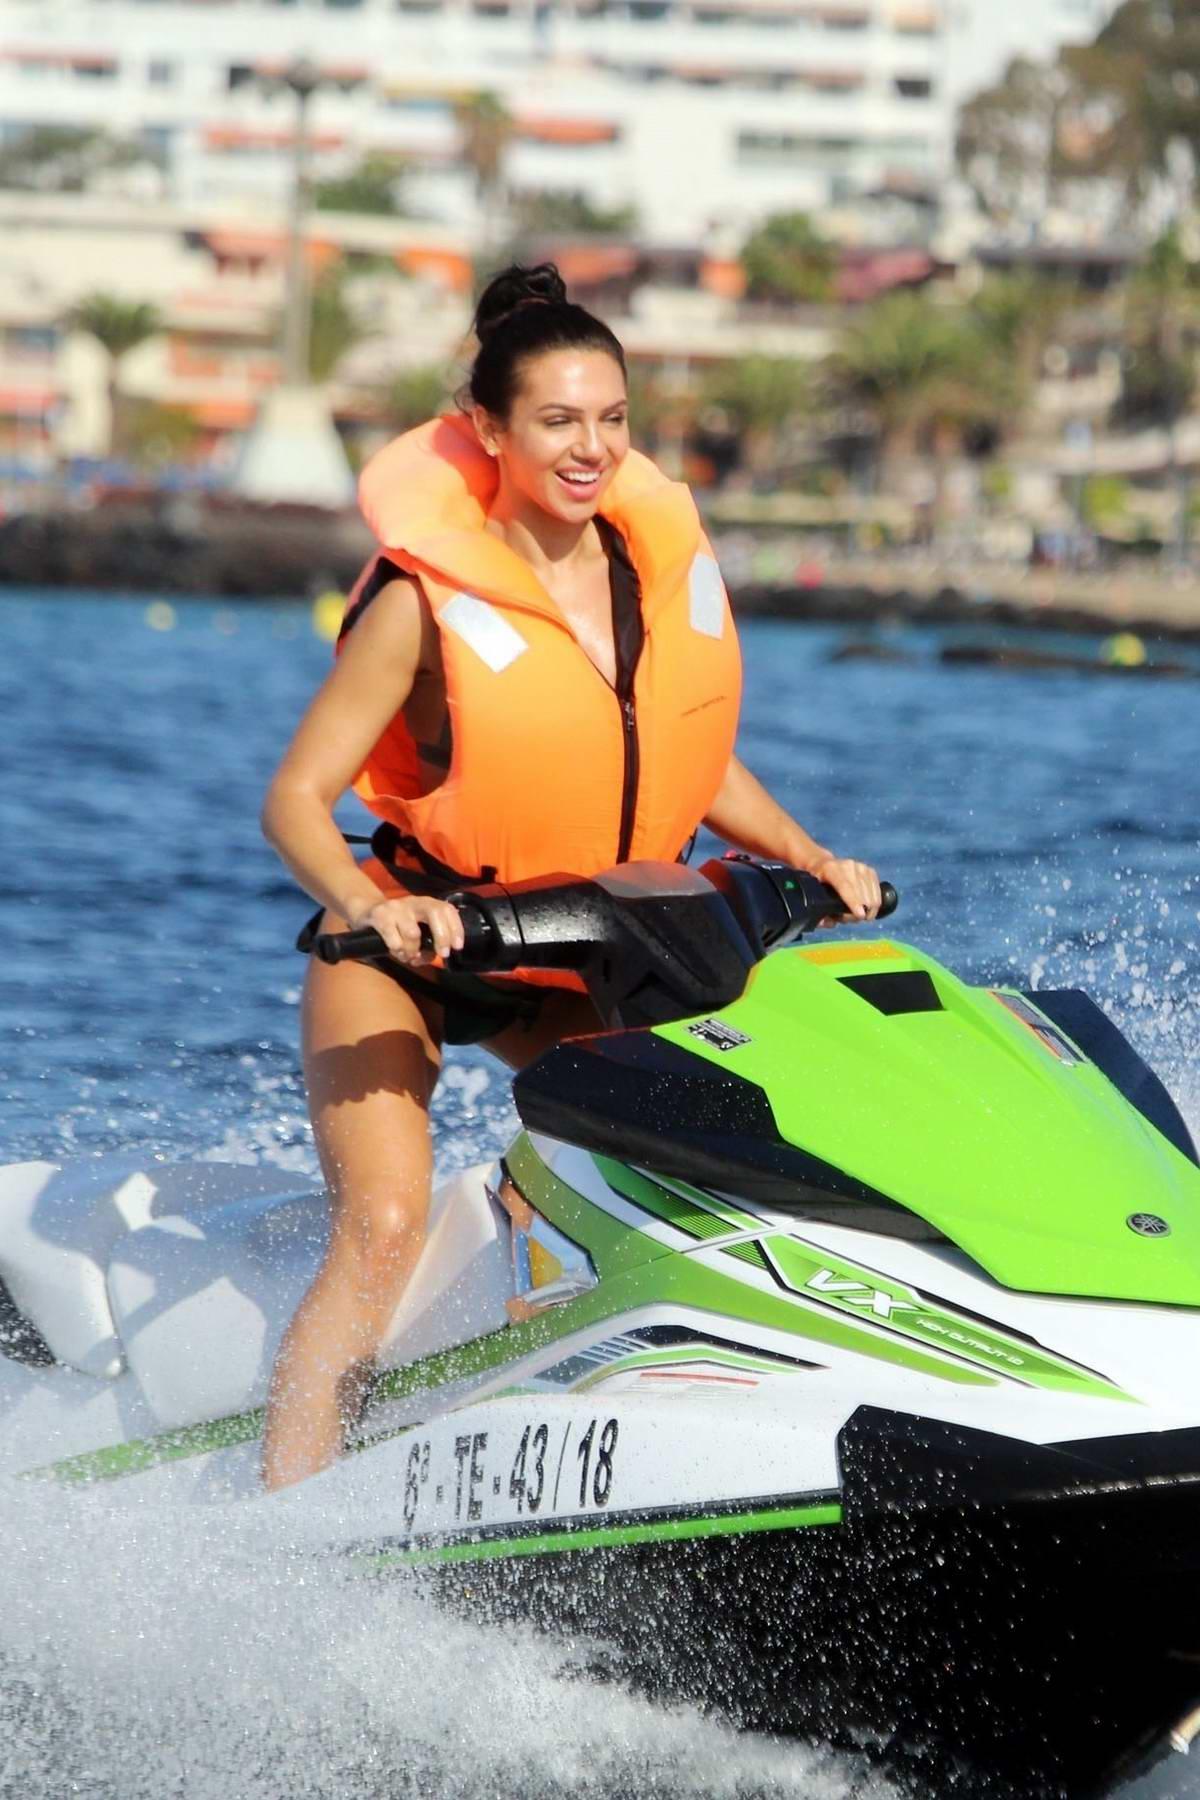 Alexandra Cane sports a green bikini as she rides the jet ski while on holiday in Tenerife, Spain